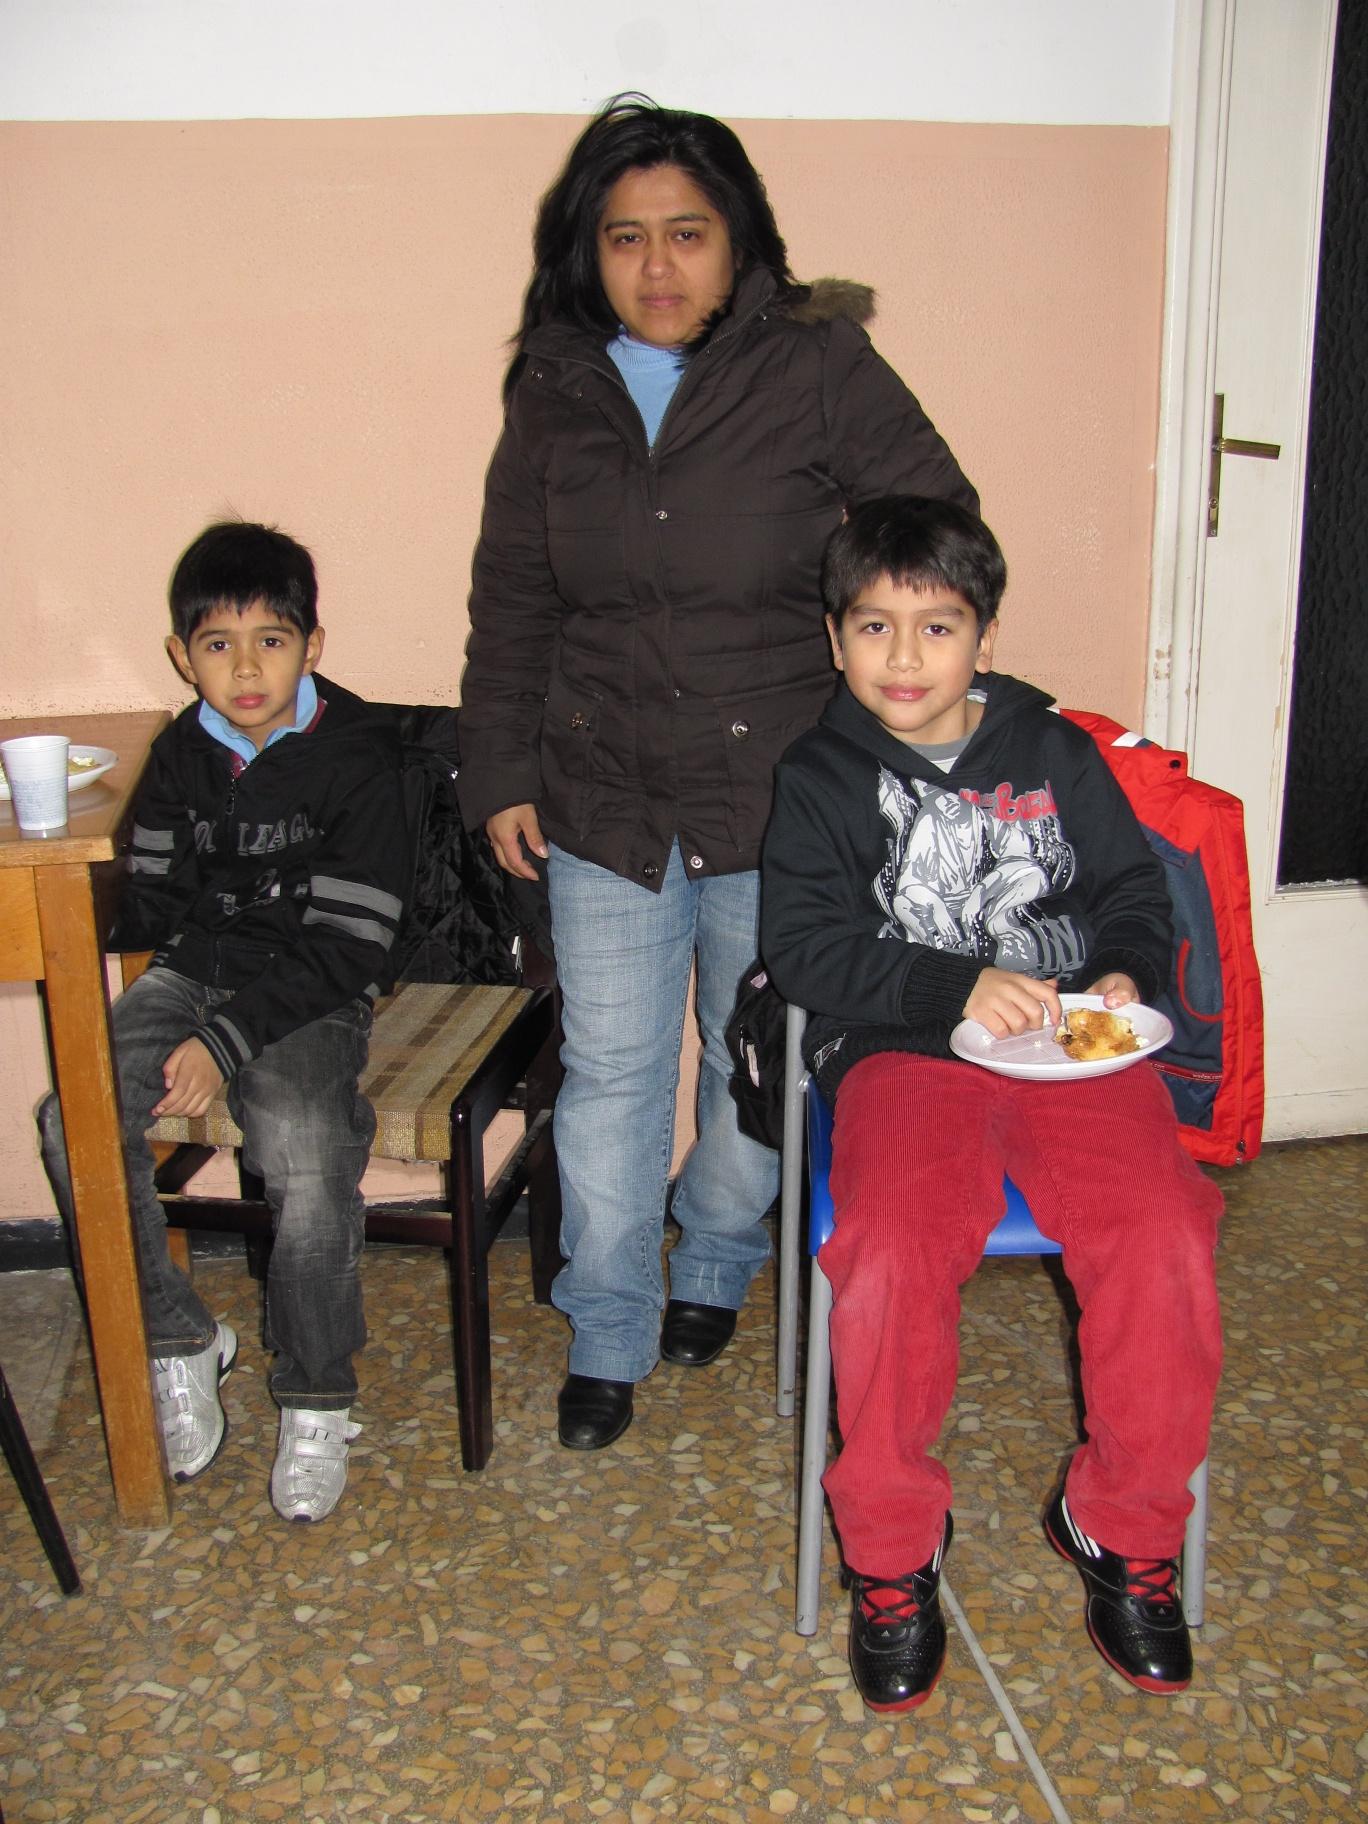 ricordo_battesimo_gesu_2011-01-23-16-41-32